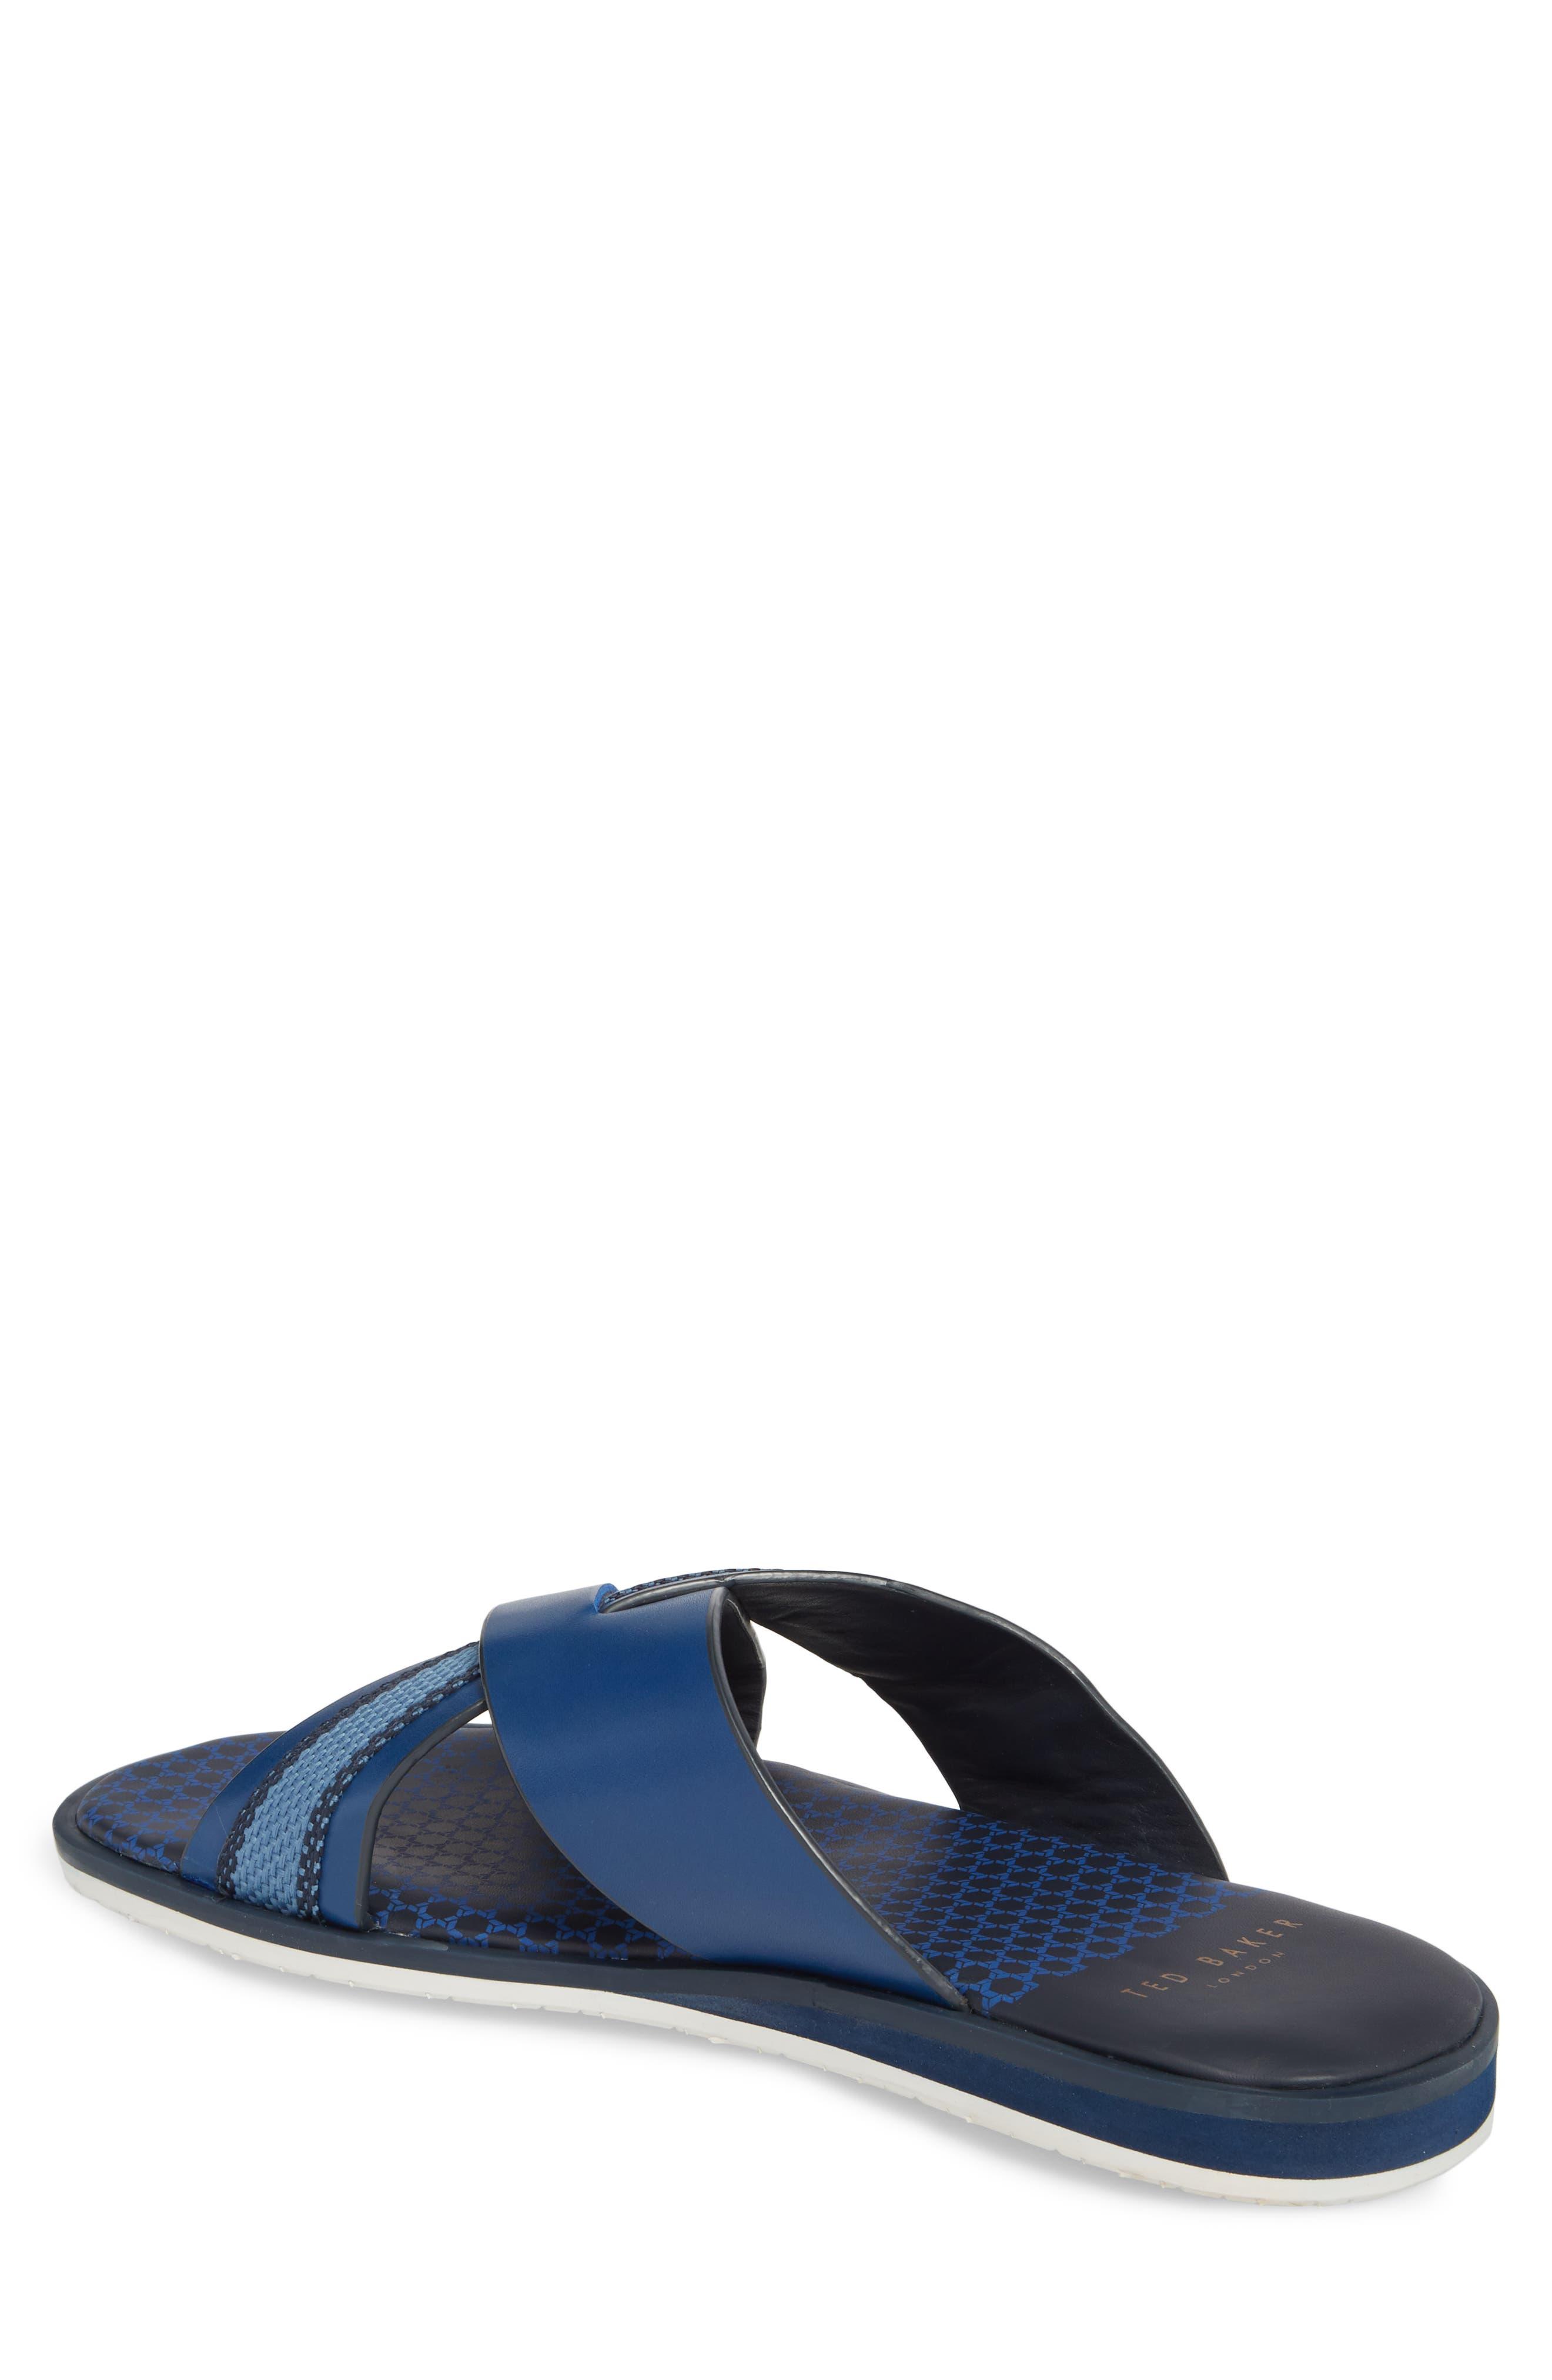 Farrull Cross Strap Slide Sandal,                             Alternate thumbnail 2, color,                             BLUE LEATHER/TEXTILE